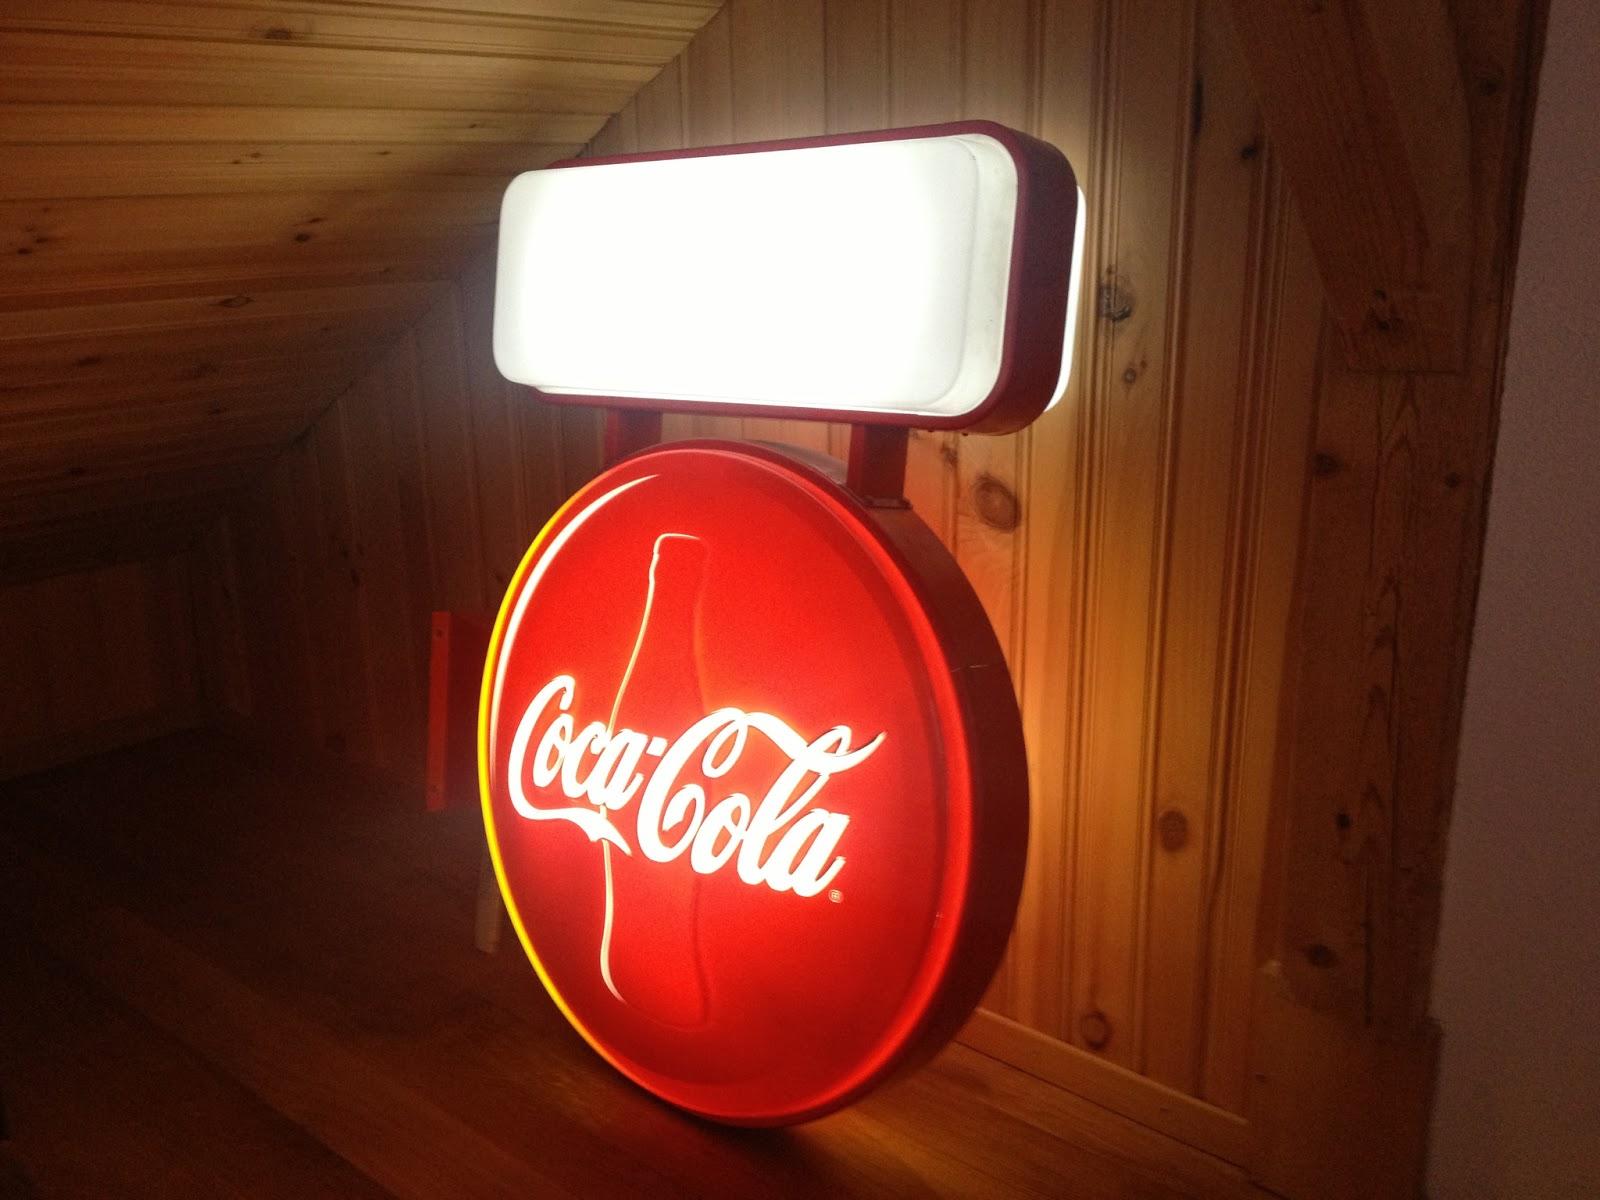 volksjewels coca cola leuchtreklame. Black Bedroom Furniture Sets. Home Design Ideas